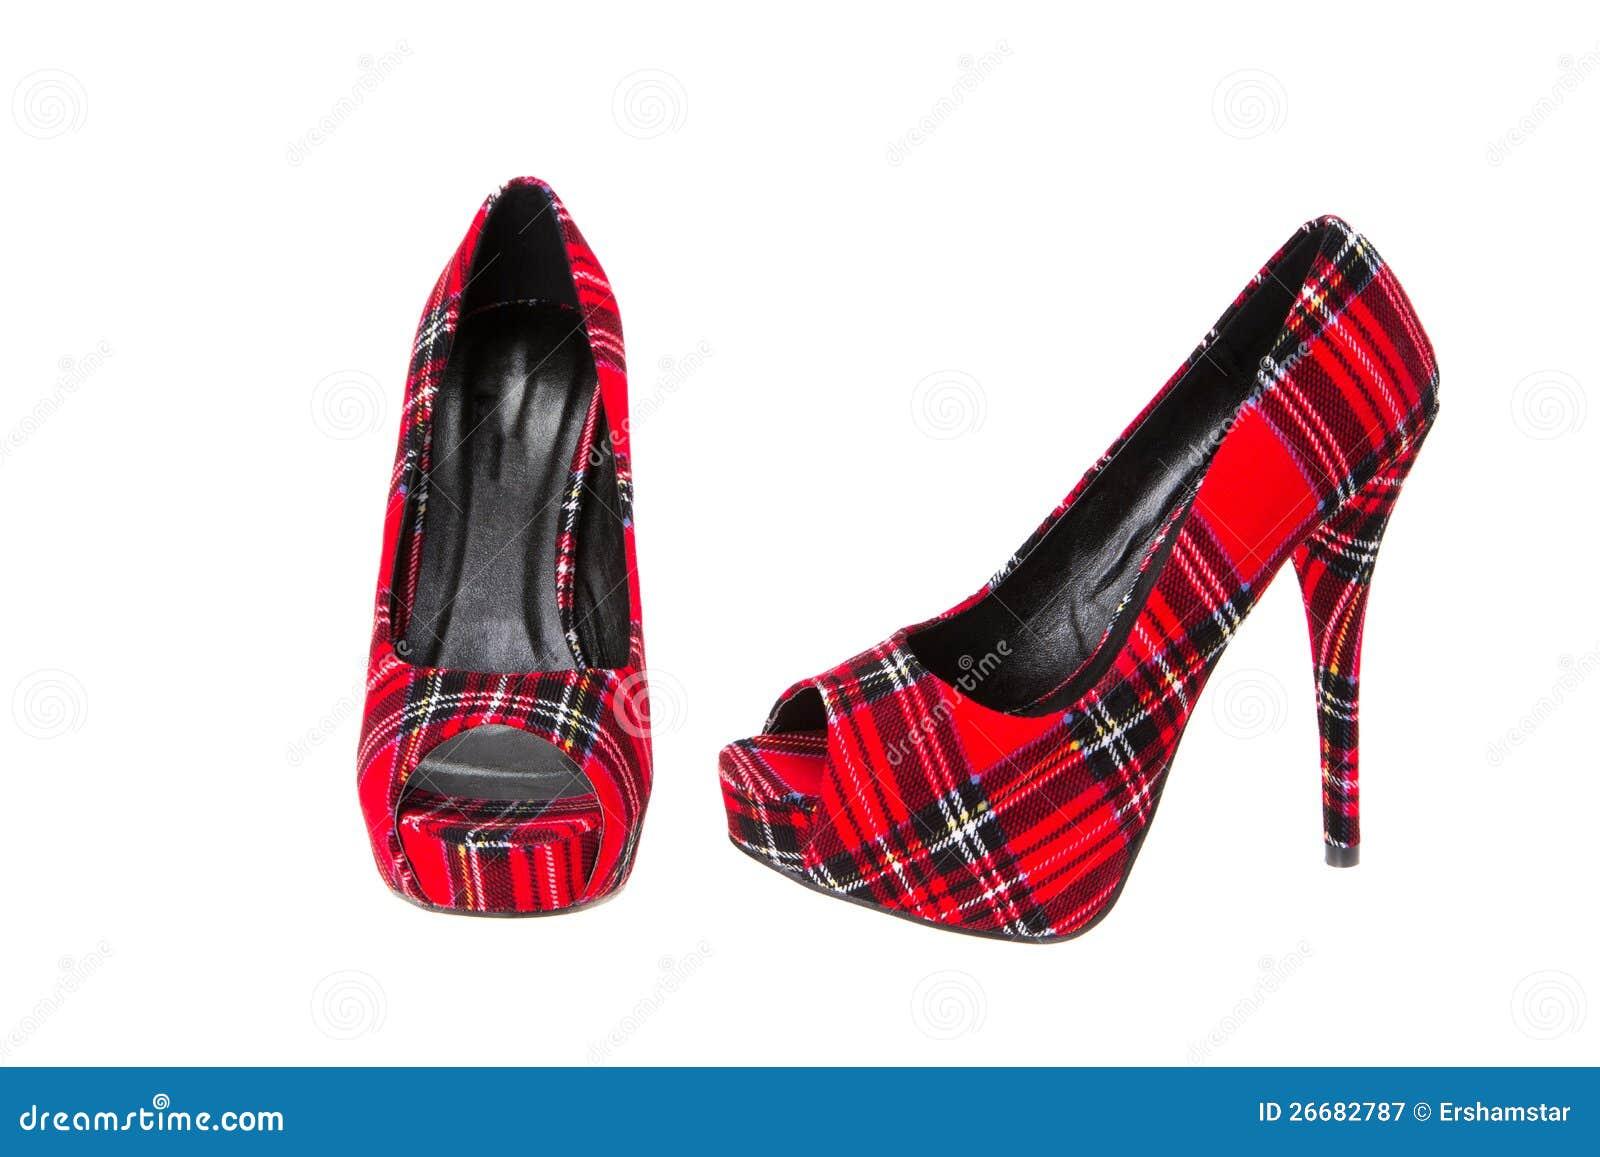 Red Tartan High Heeled Stiletto Shoes